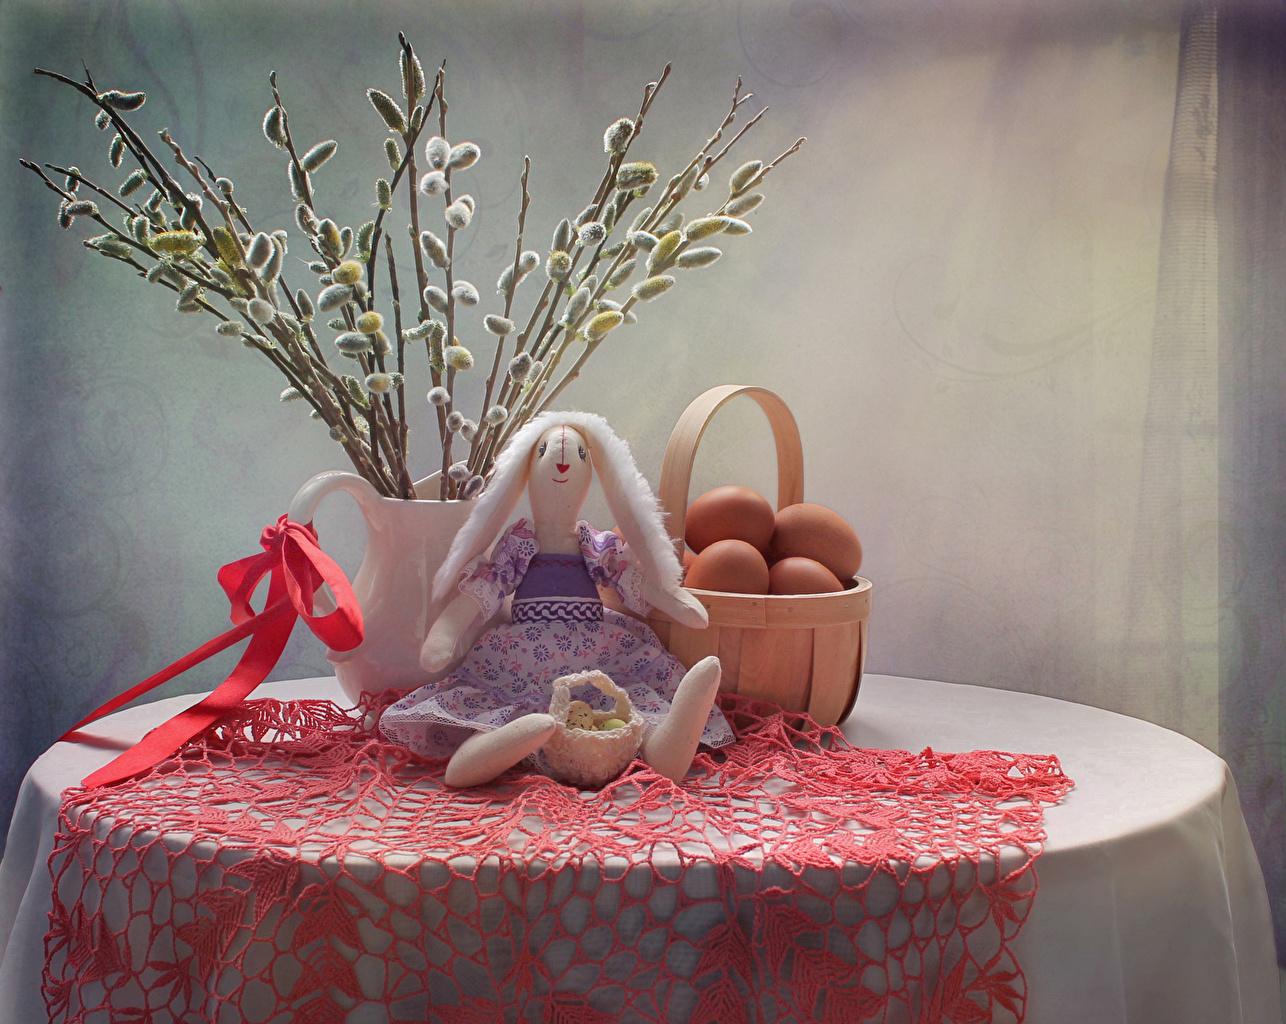 Фото Пасха куклы яйцо Корзина Еда Стол ветвь Бантик Натюрморт Кукла яиц Яйца яйцами корзины Корзинка Пища стола ветка столы Ветки бантики на ветке Продукты питания